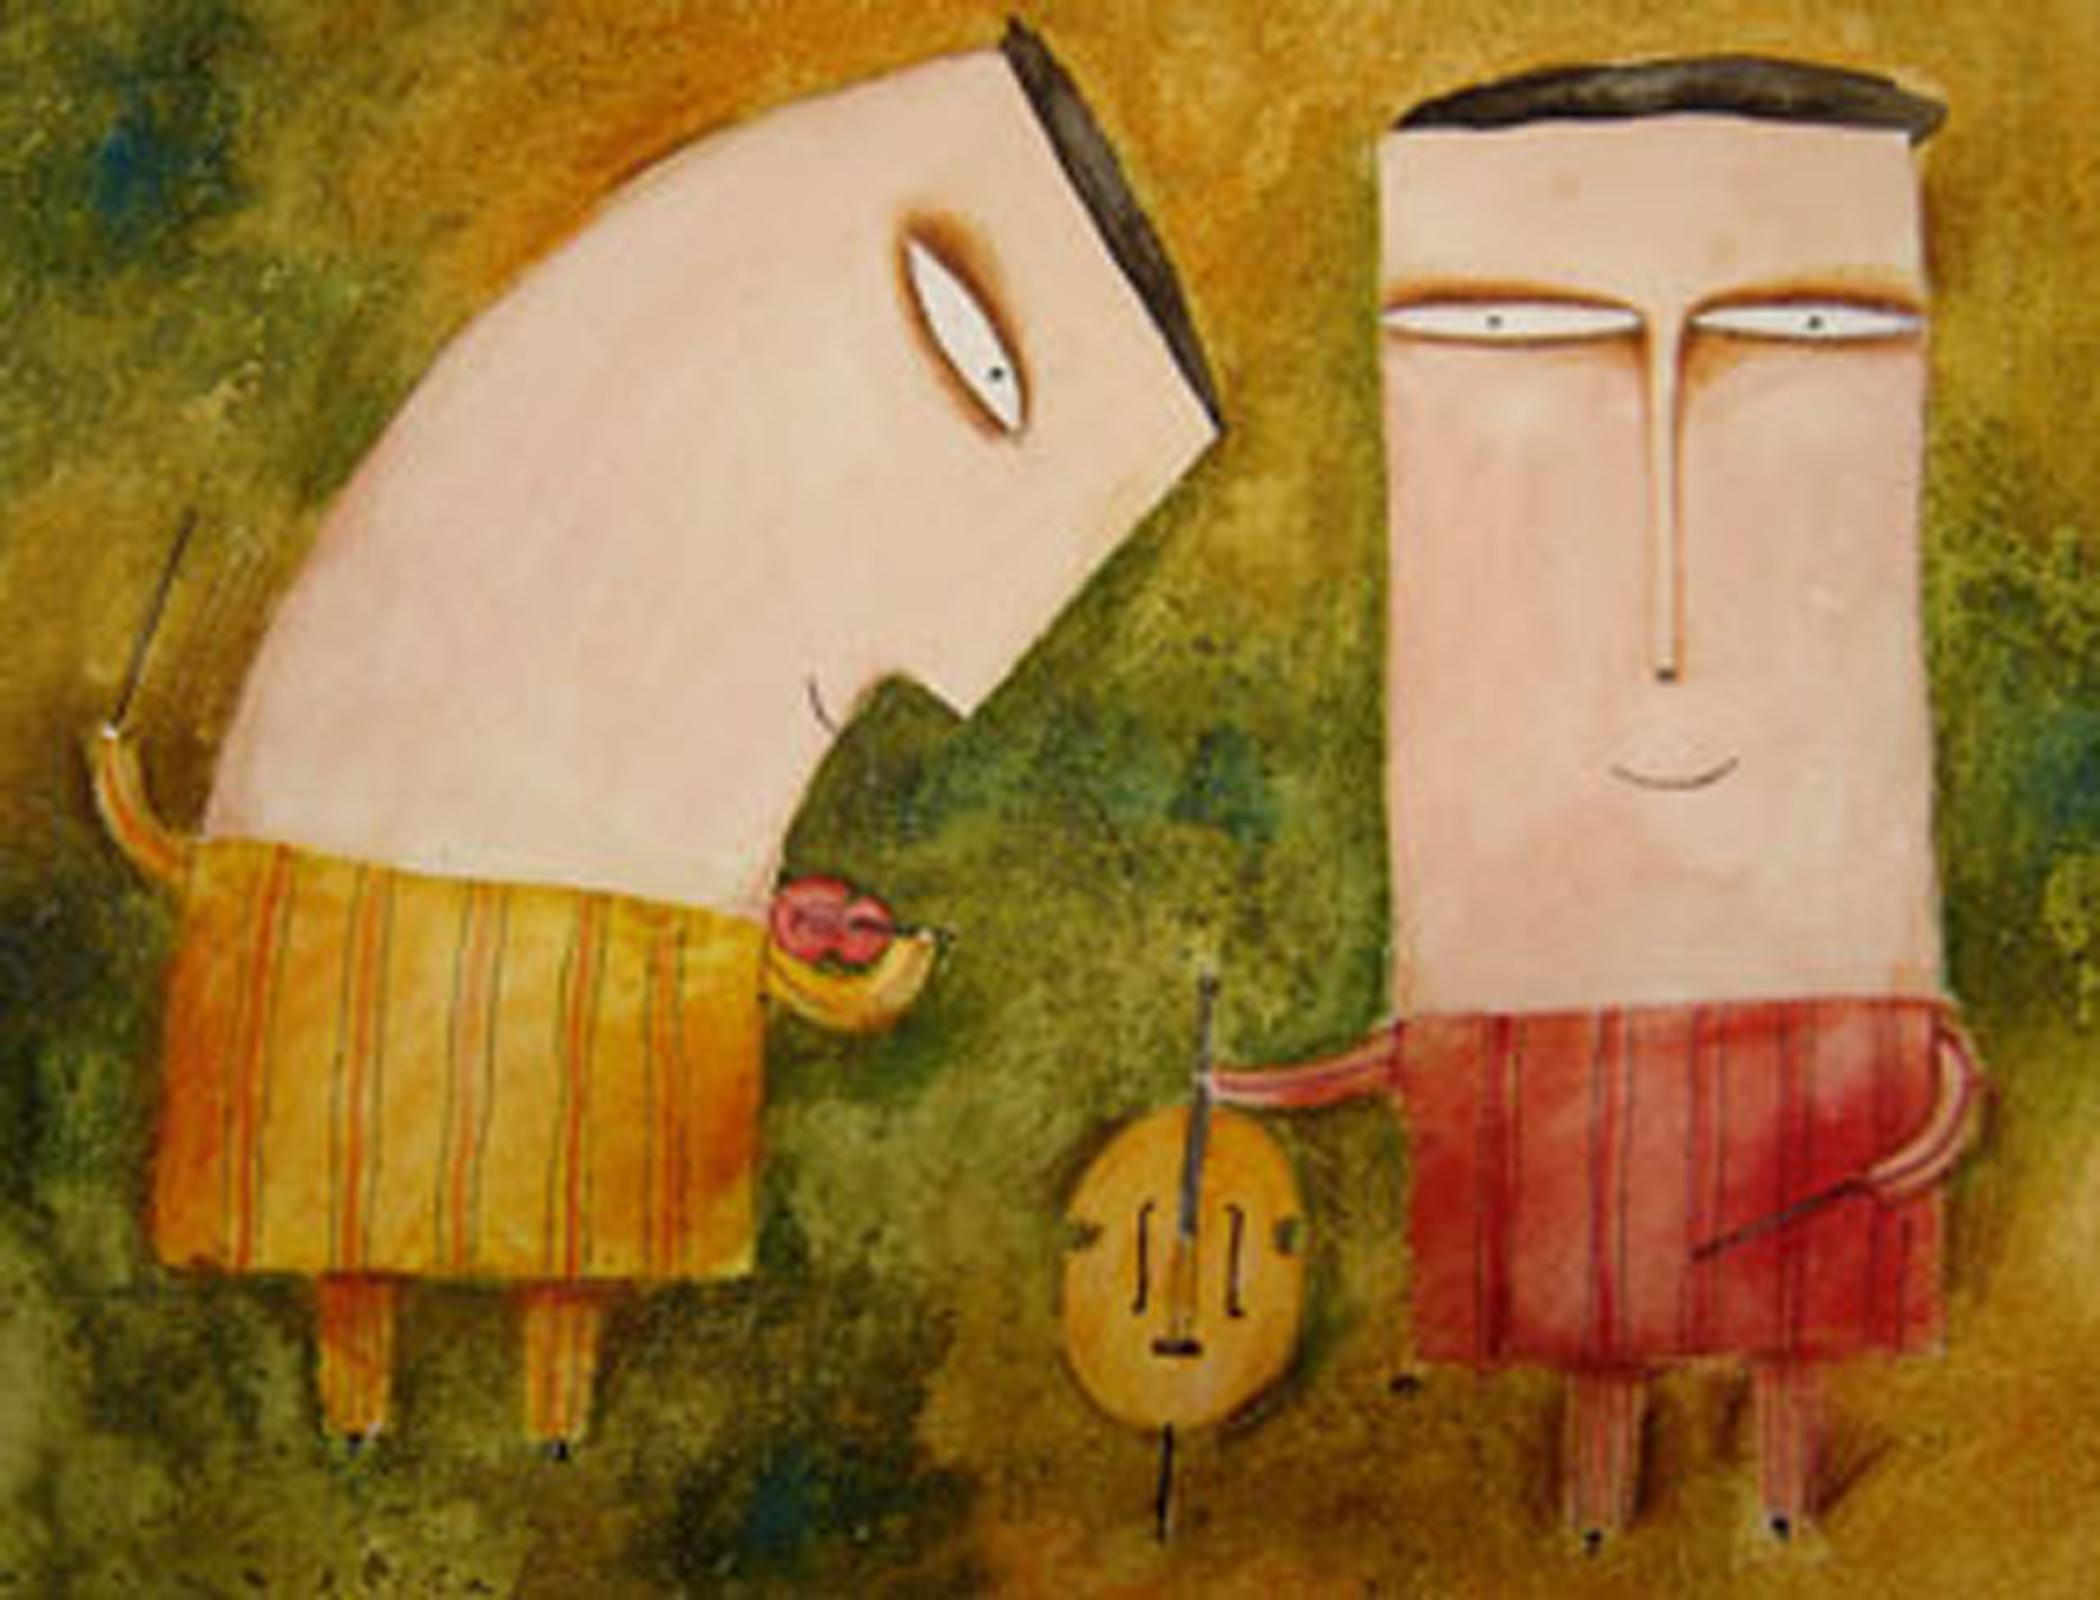 dueto-de-cabezones